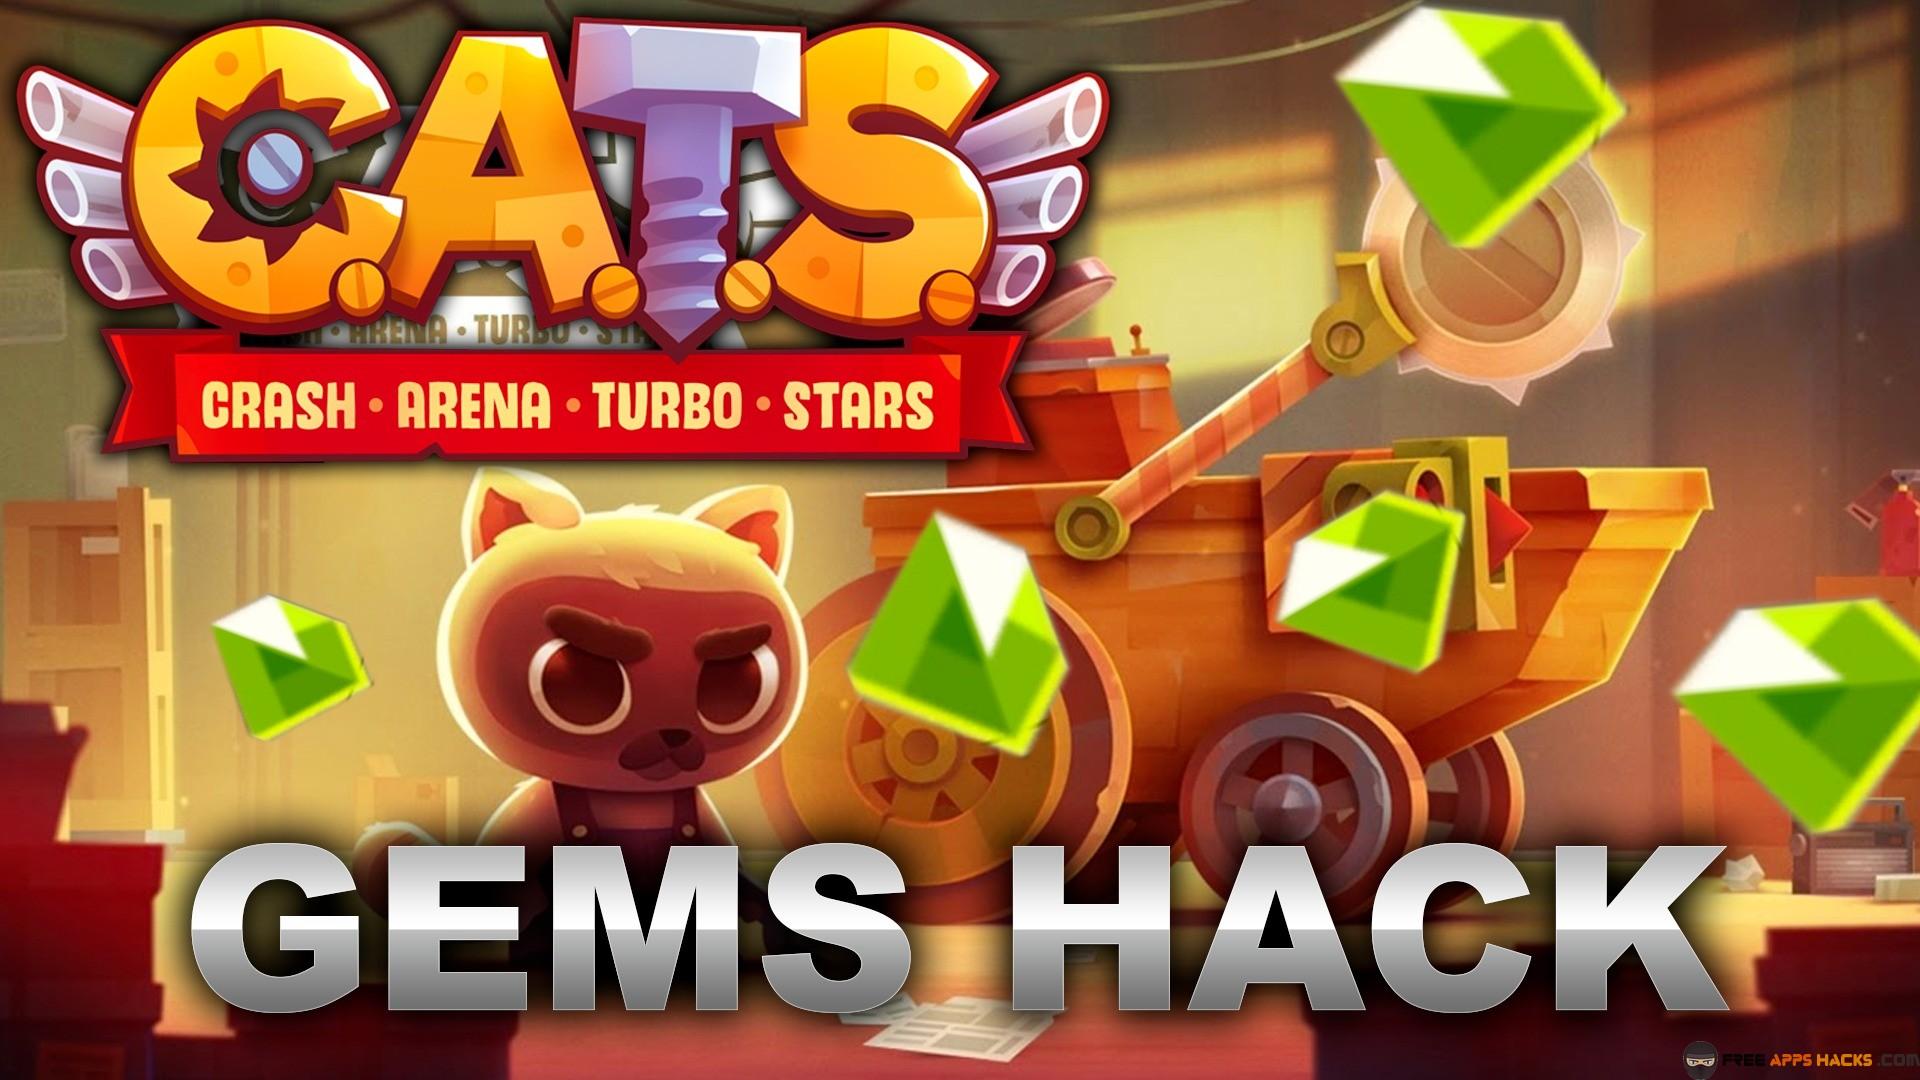 CATS Crash Arena Turbo Stars Modded APK Unlocked Android App